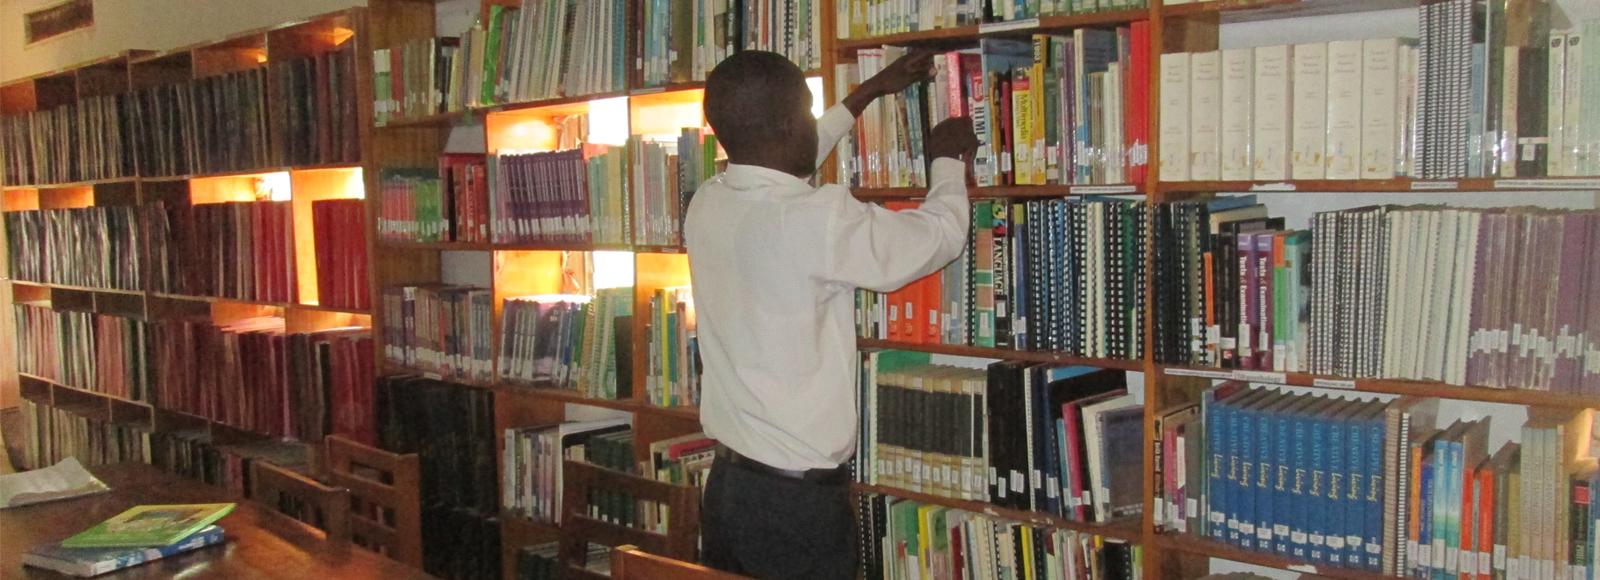 Fully Stocked Library